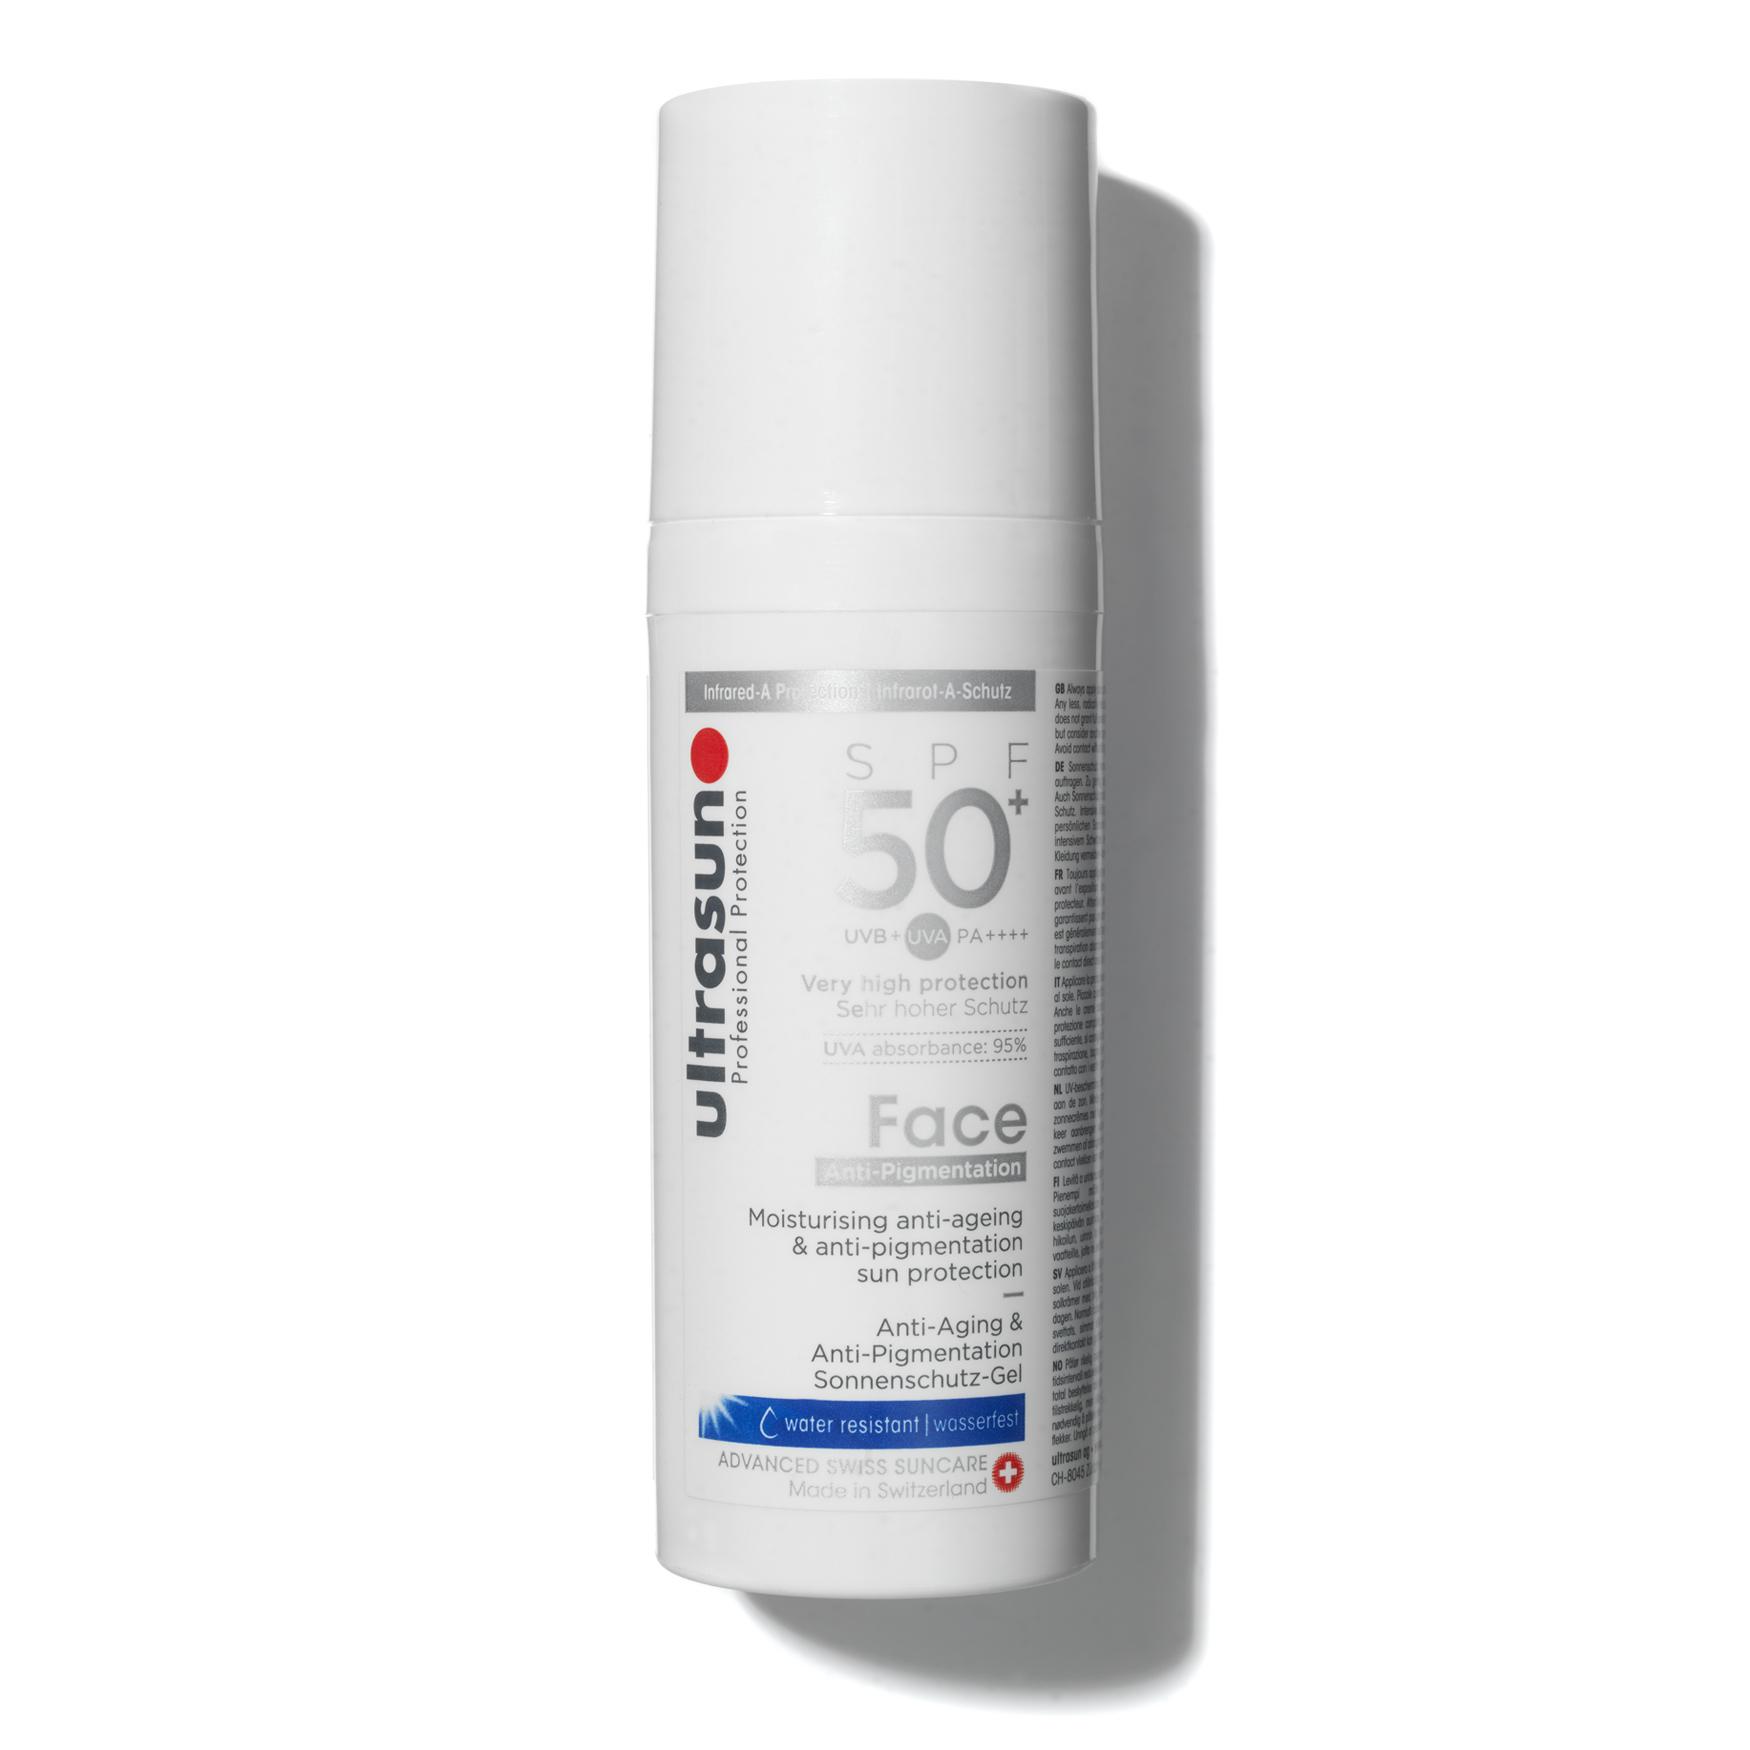 Ultrasun Very High 50+ SPF Face Anti Pigmentation Treatment, , large